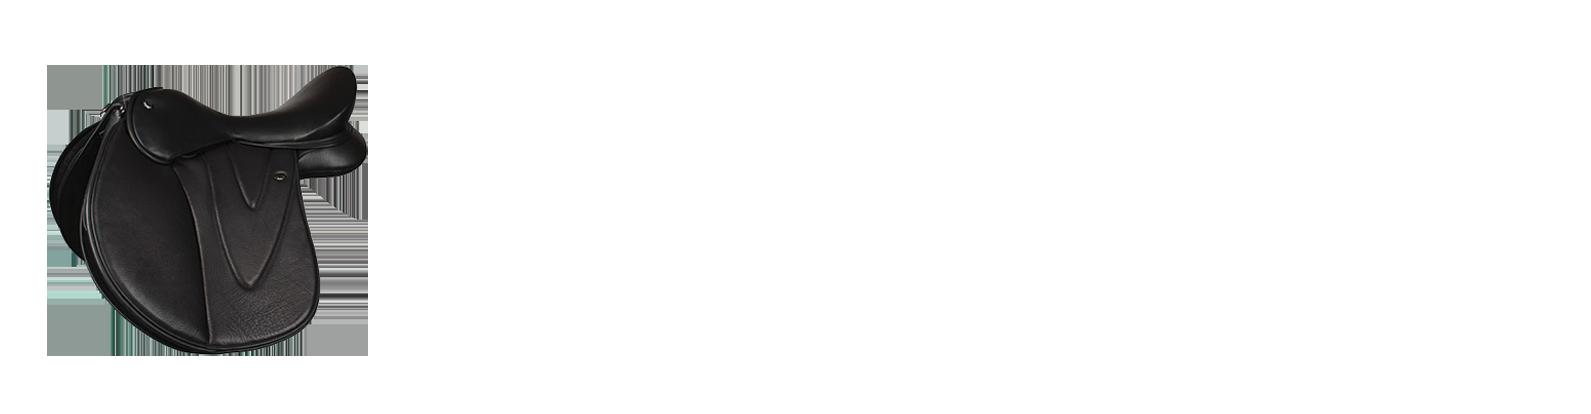 MD siodła |